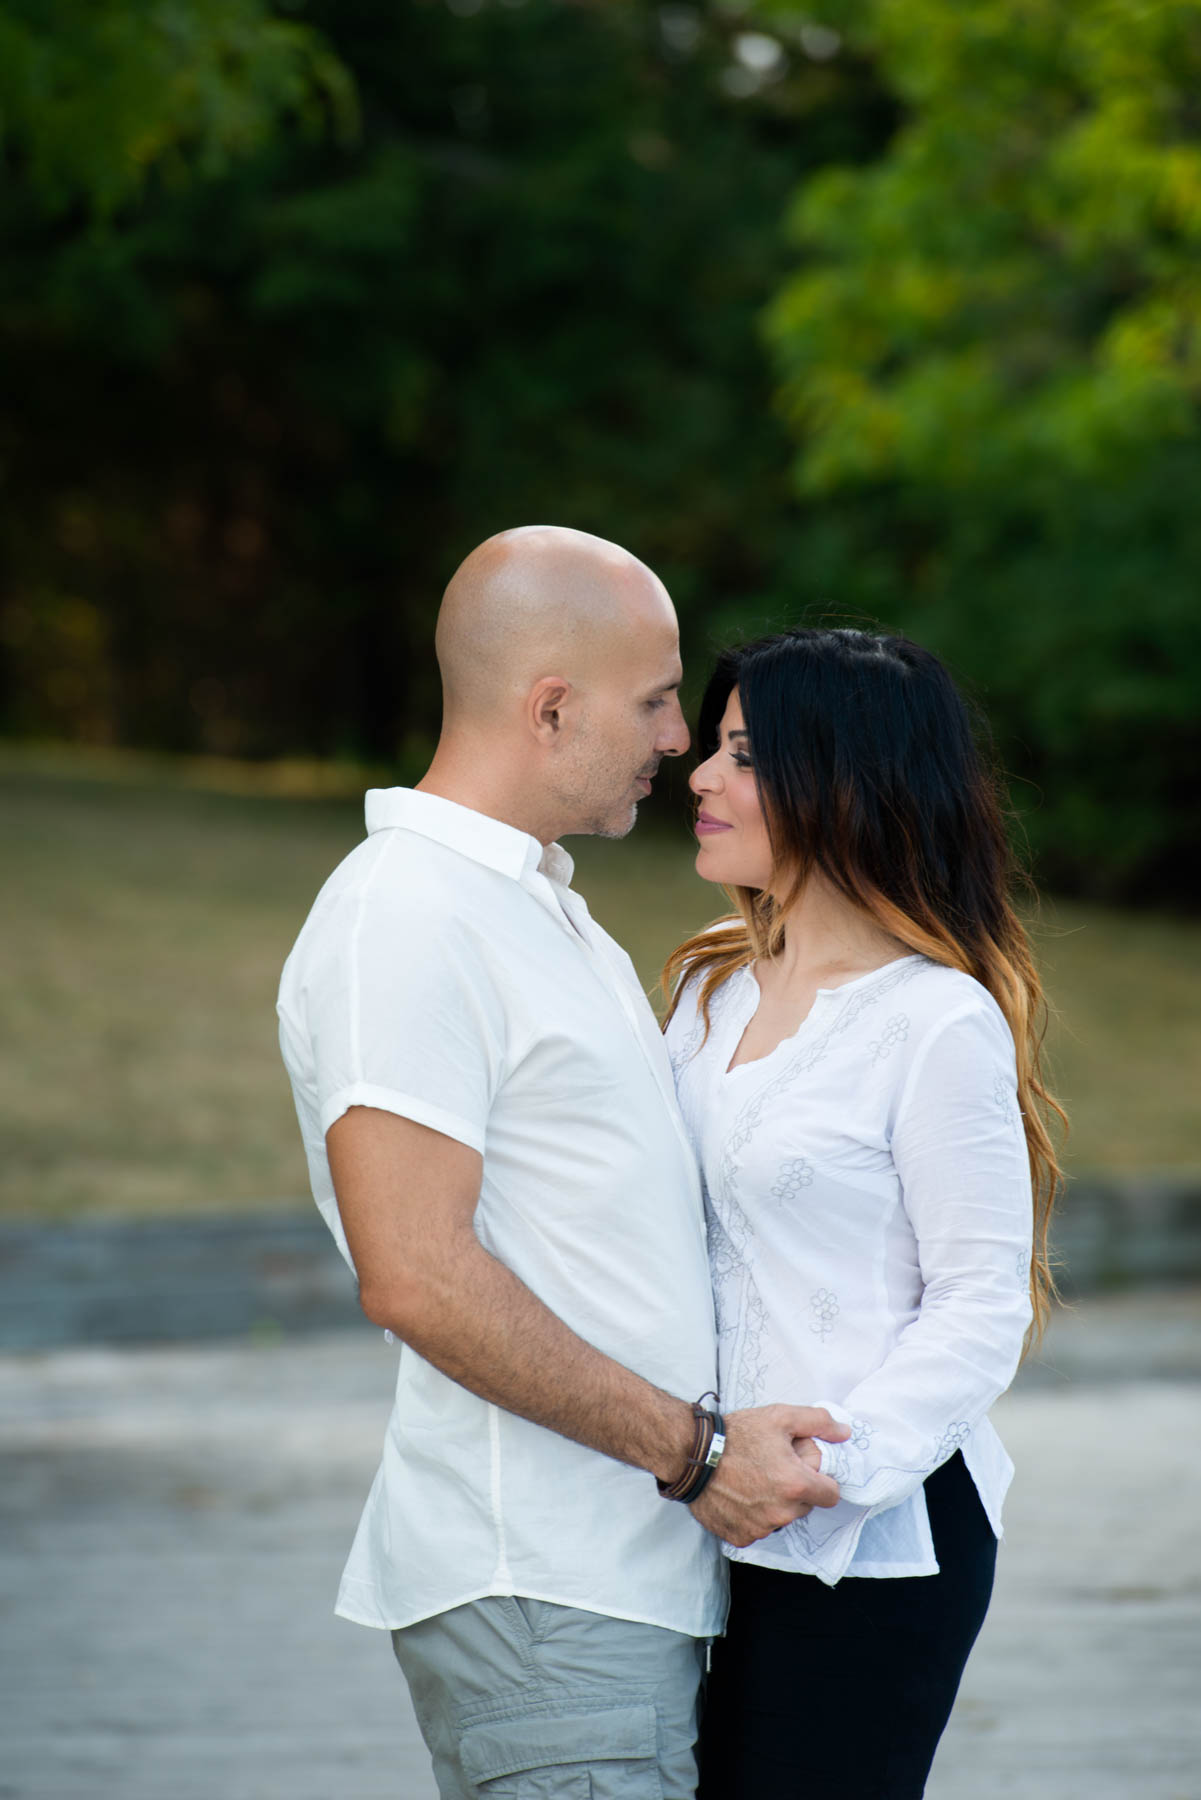 016 - Engagement FL Humber Bay Park - Toronto